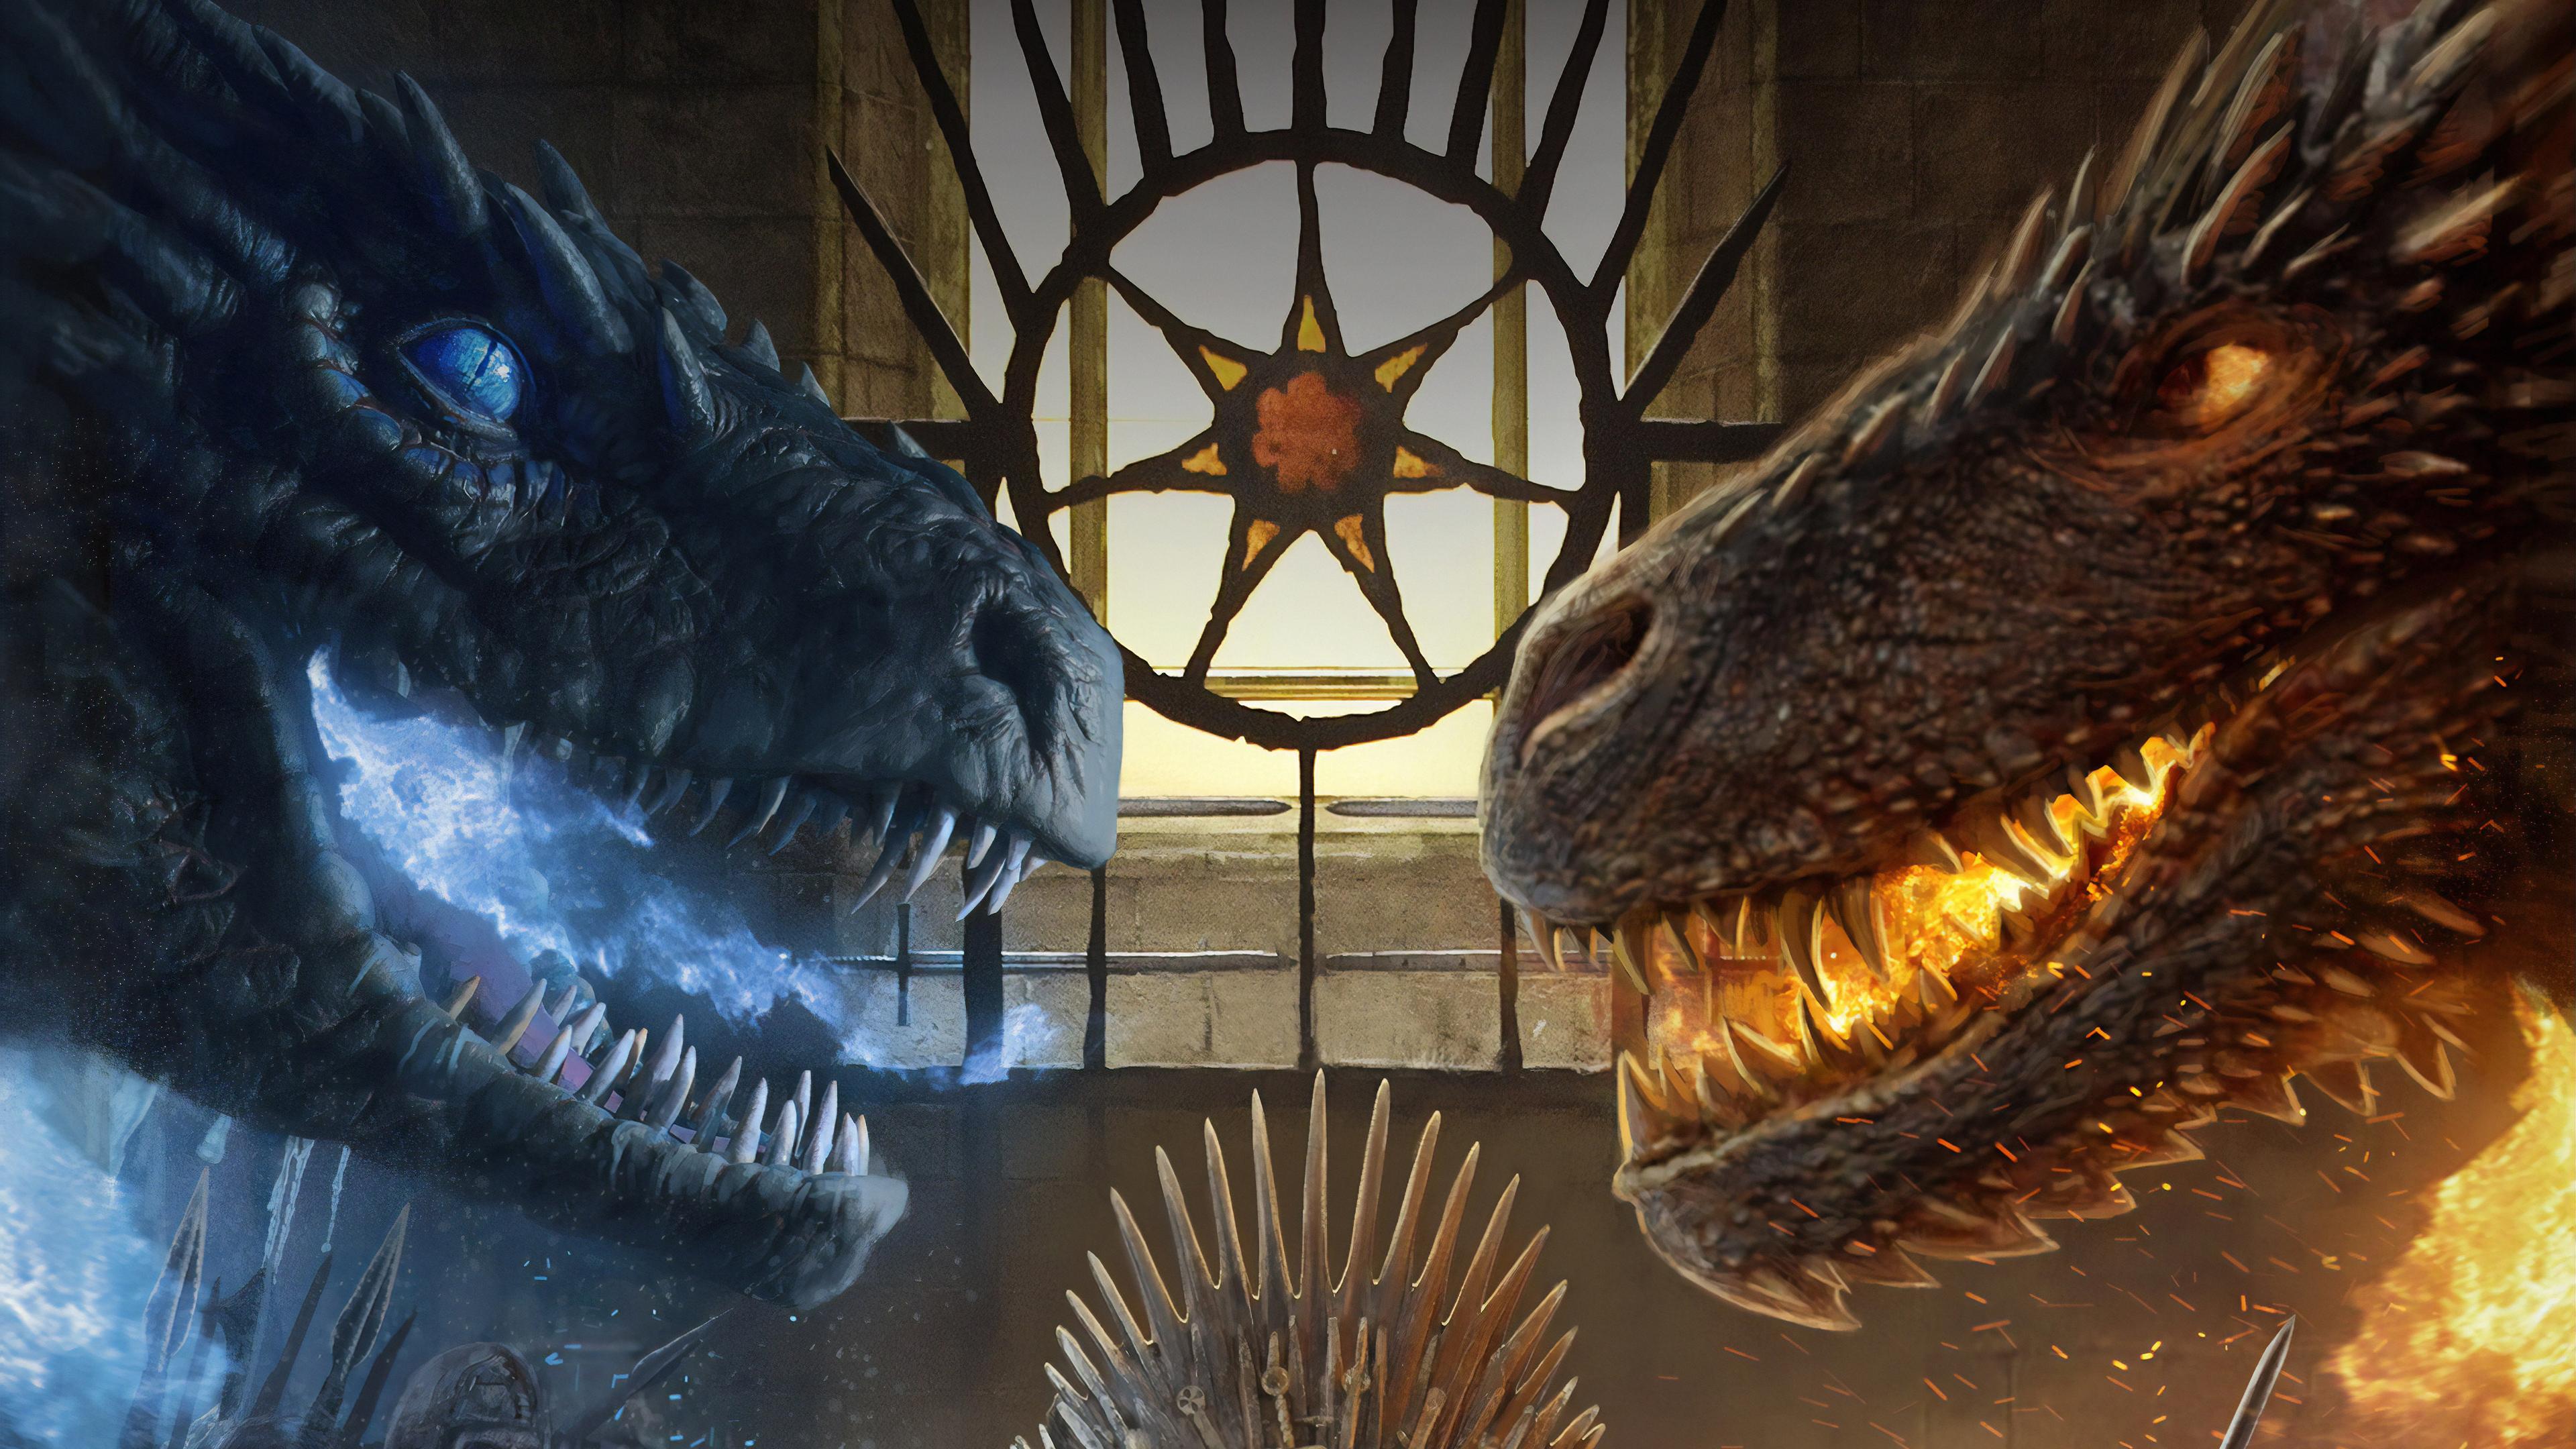 night and fire dragon 1577915097 - Night And Fire Dragon -